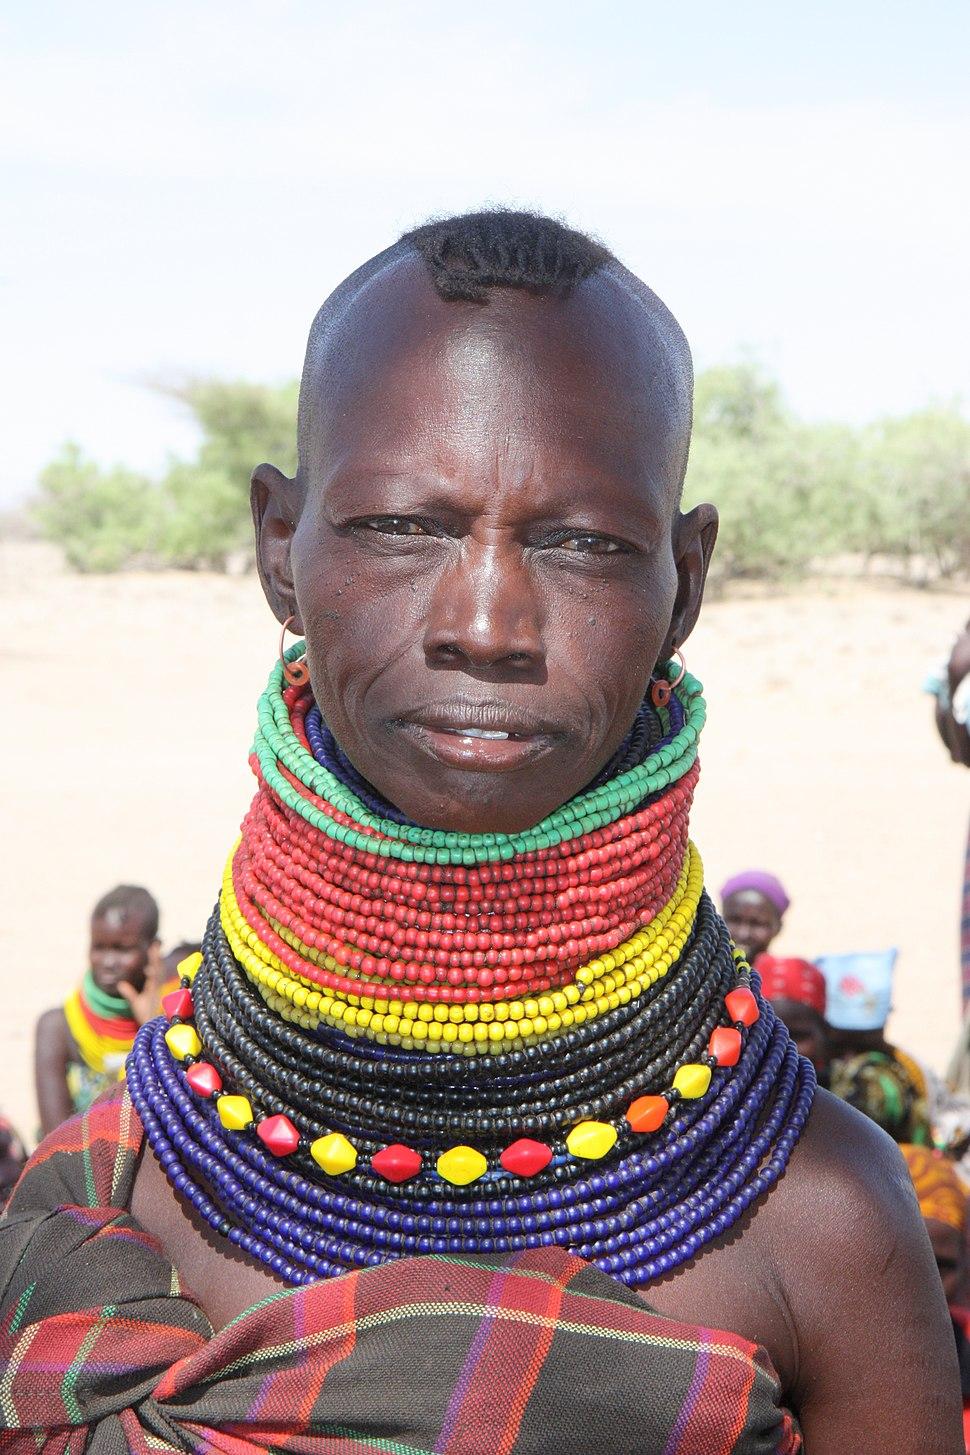 A woman wearing traditional tribal beads in Turkana, Kenya, October 2012 (8405274783)